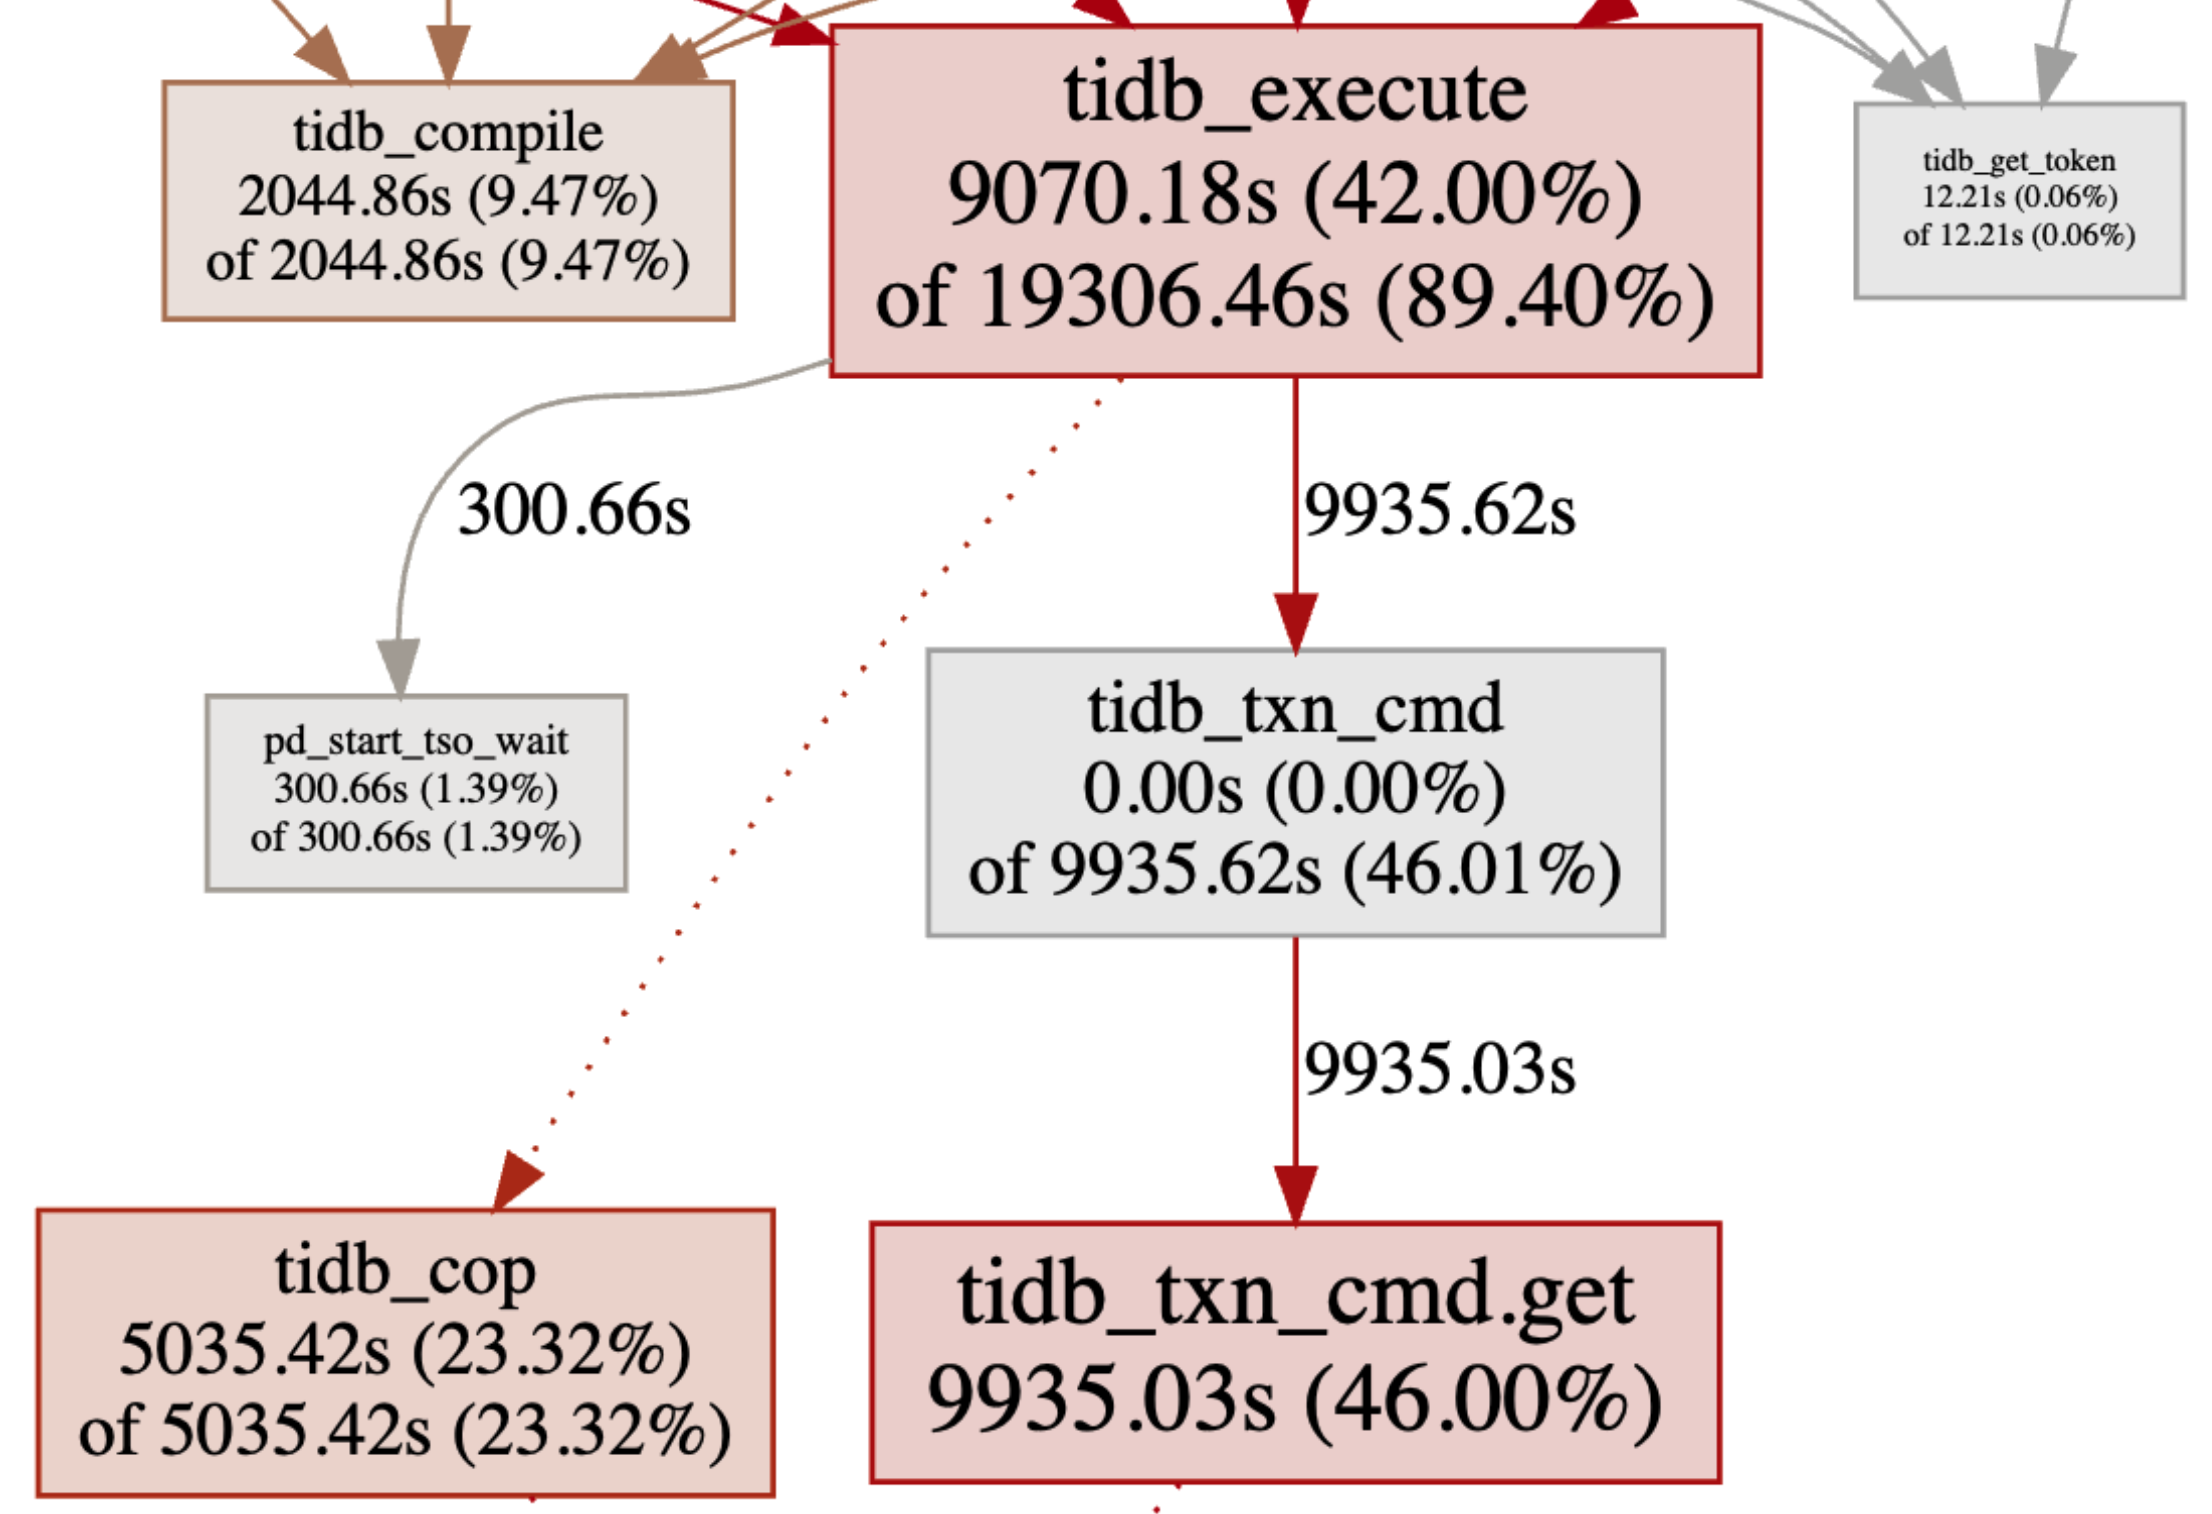 tidb_execute node relation example1